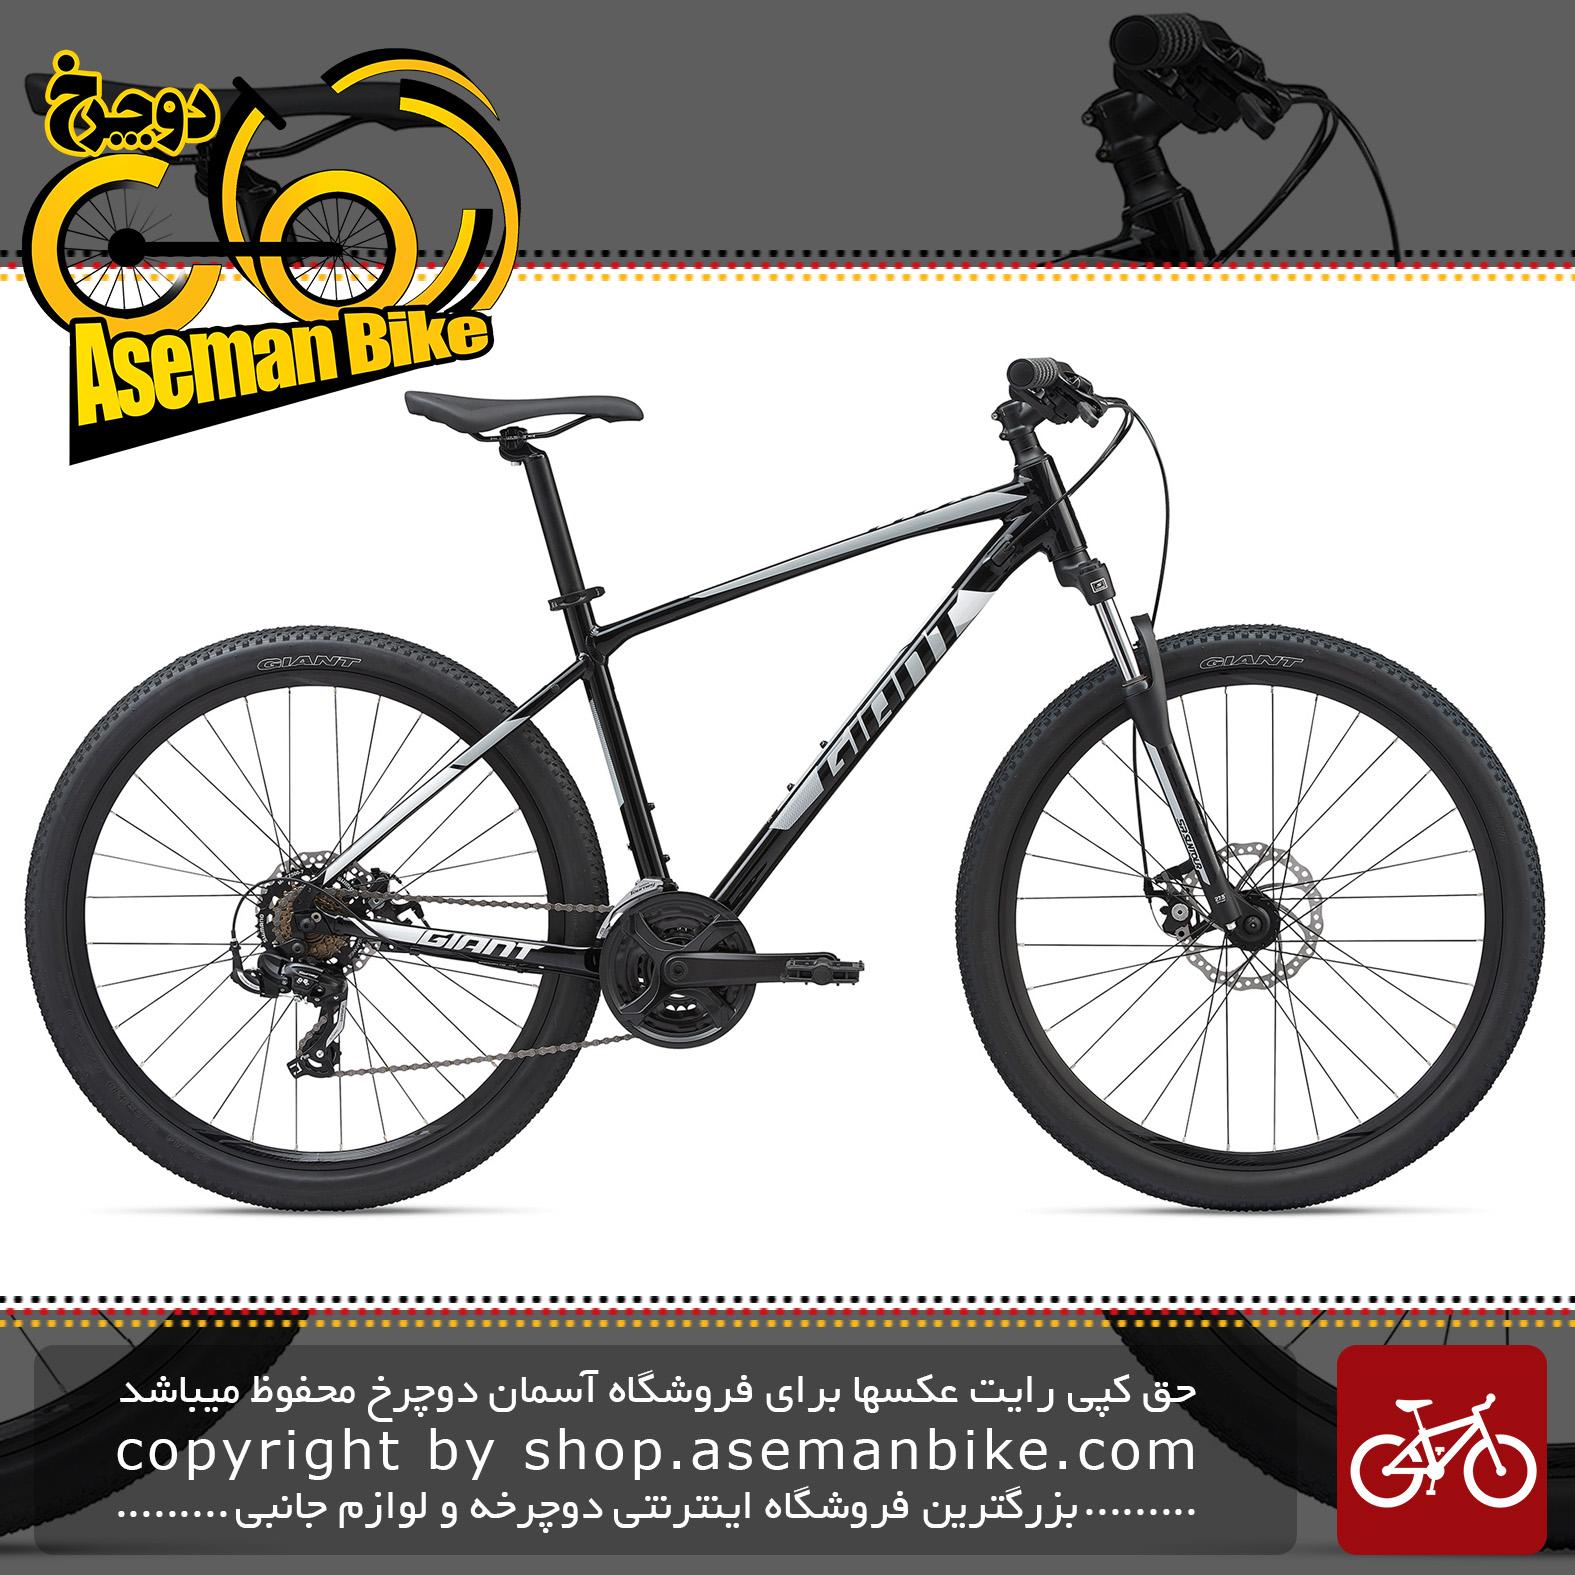 دوچرخه کوهستان جاینت مدل ای تی ایکس 3 دیسک هیدرولیک 2020 Giant Mountain Bicycle ATX 3 Disc 2020